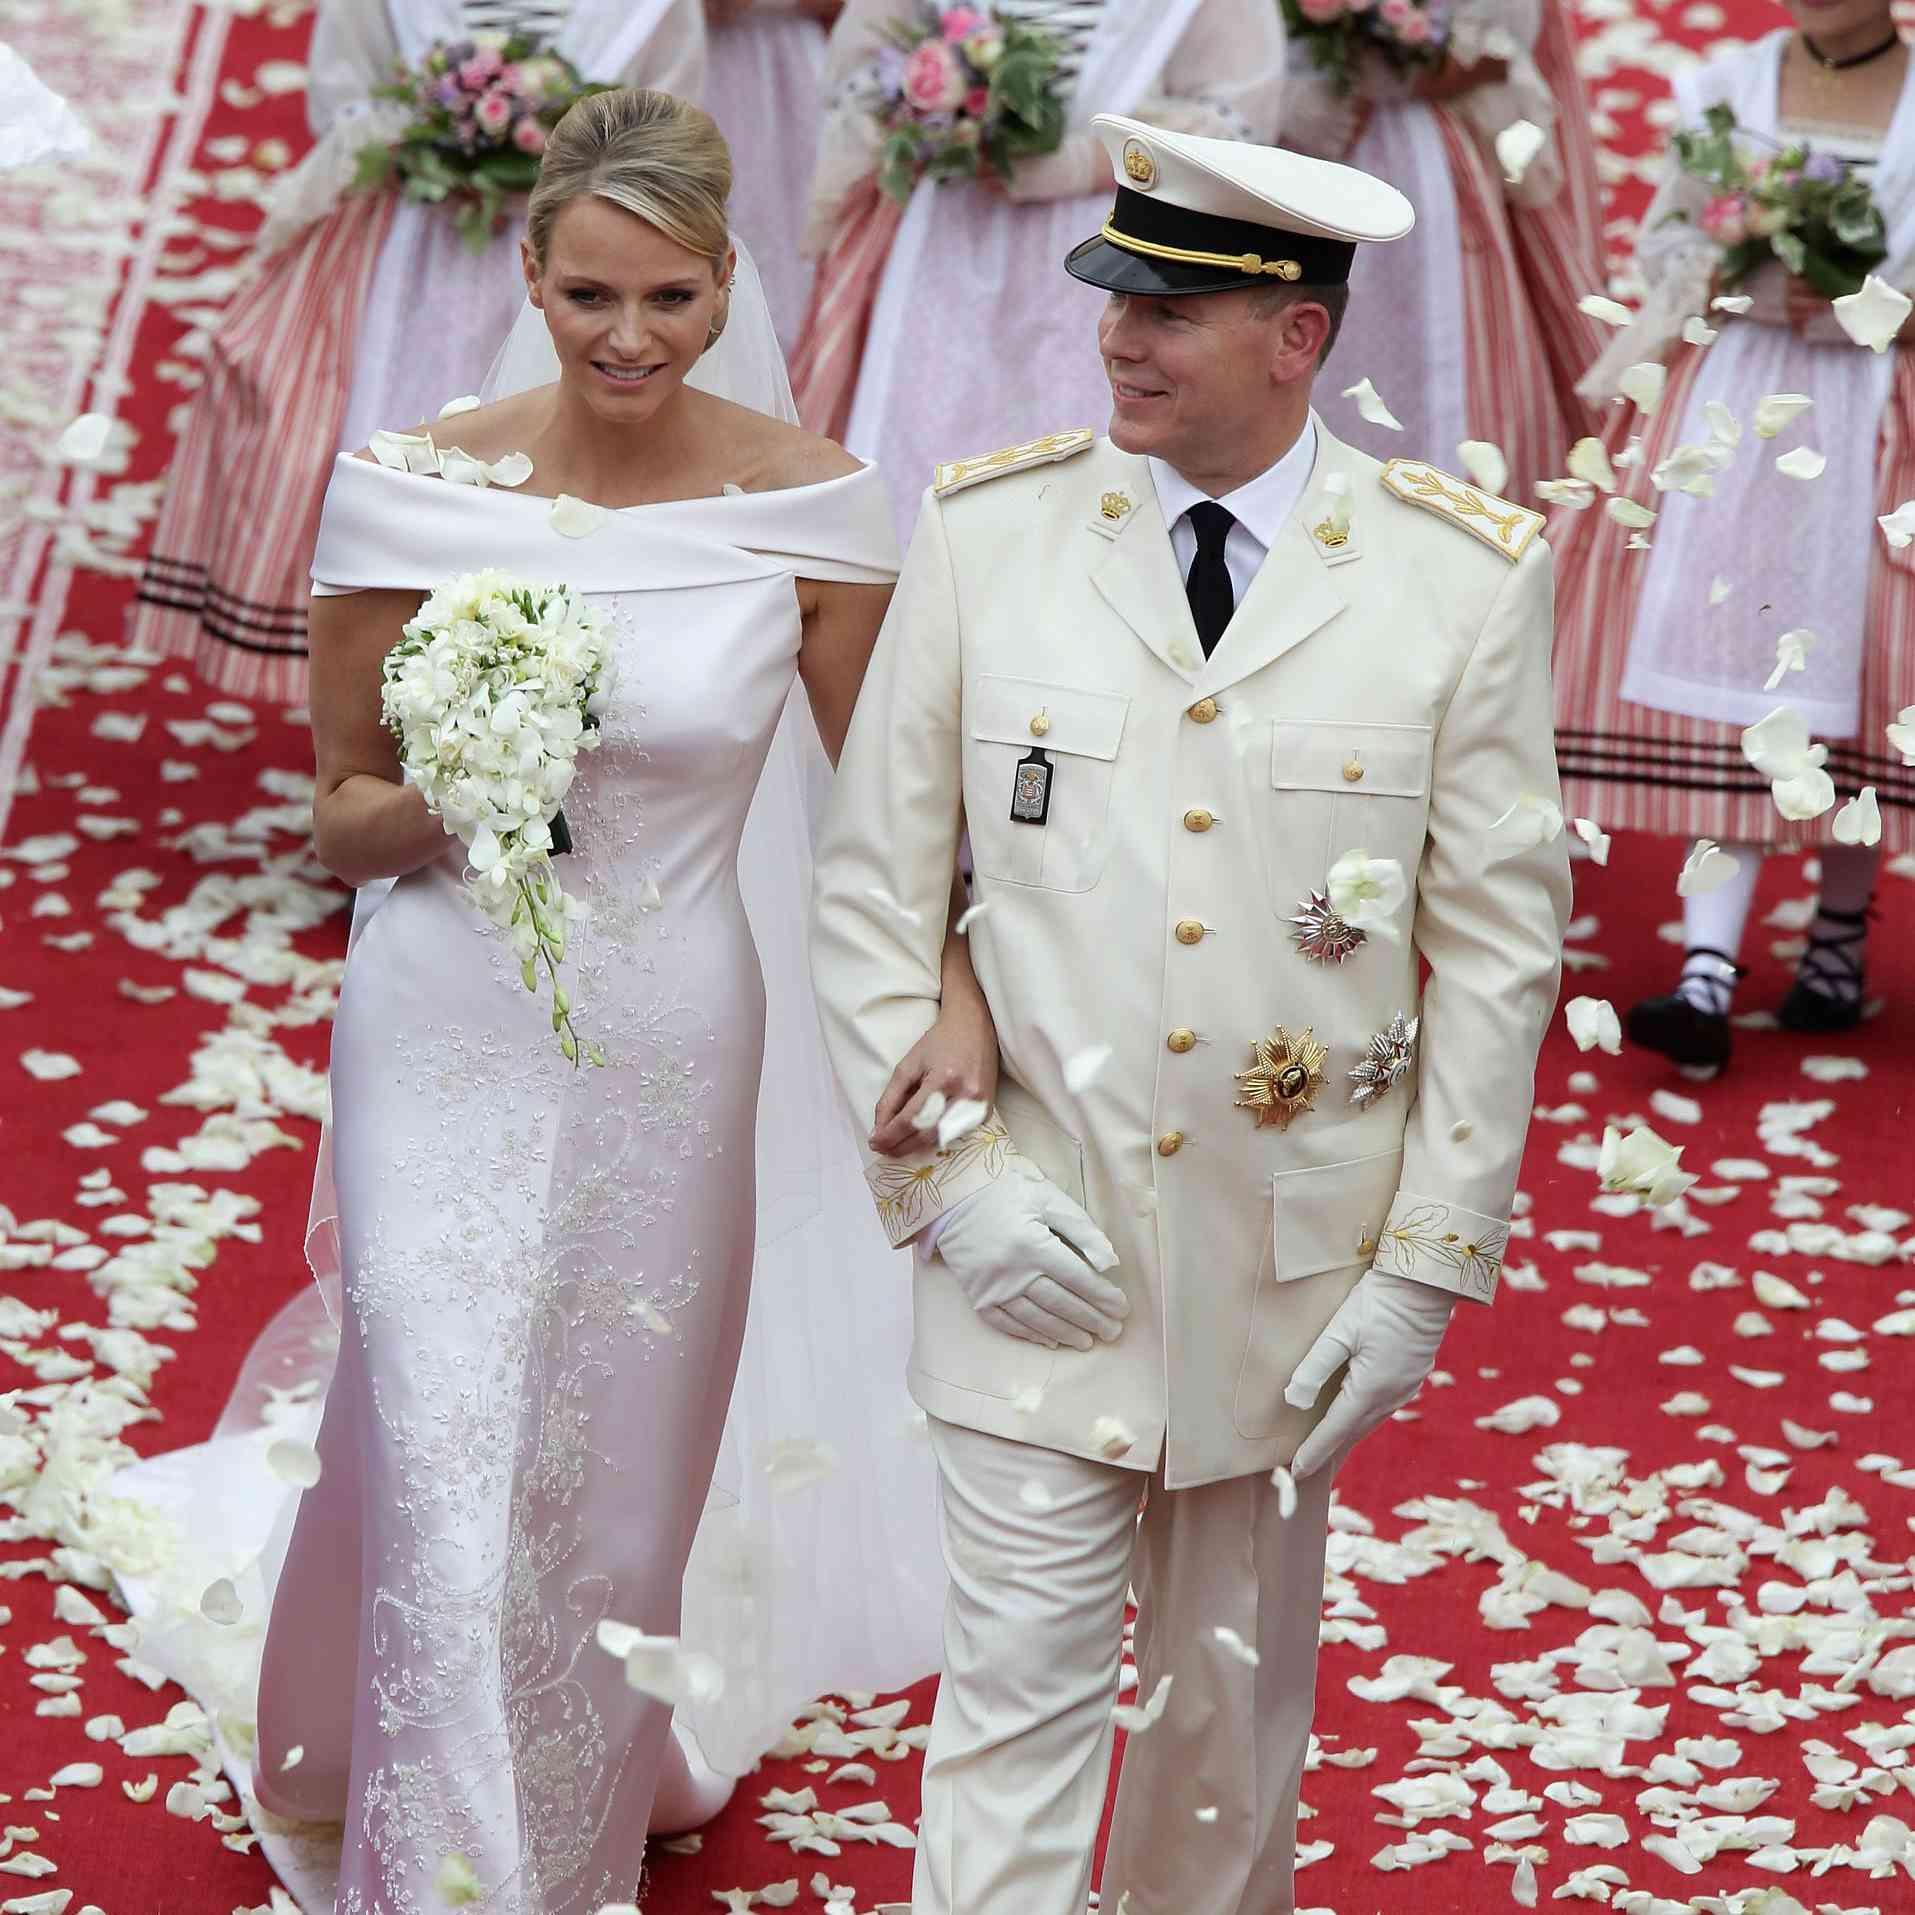 Princess Charlene of Monaco and Prince Albert II on their wedding day